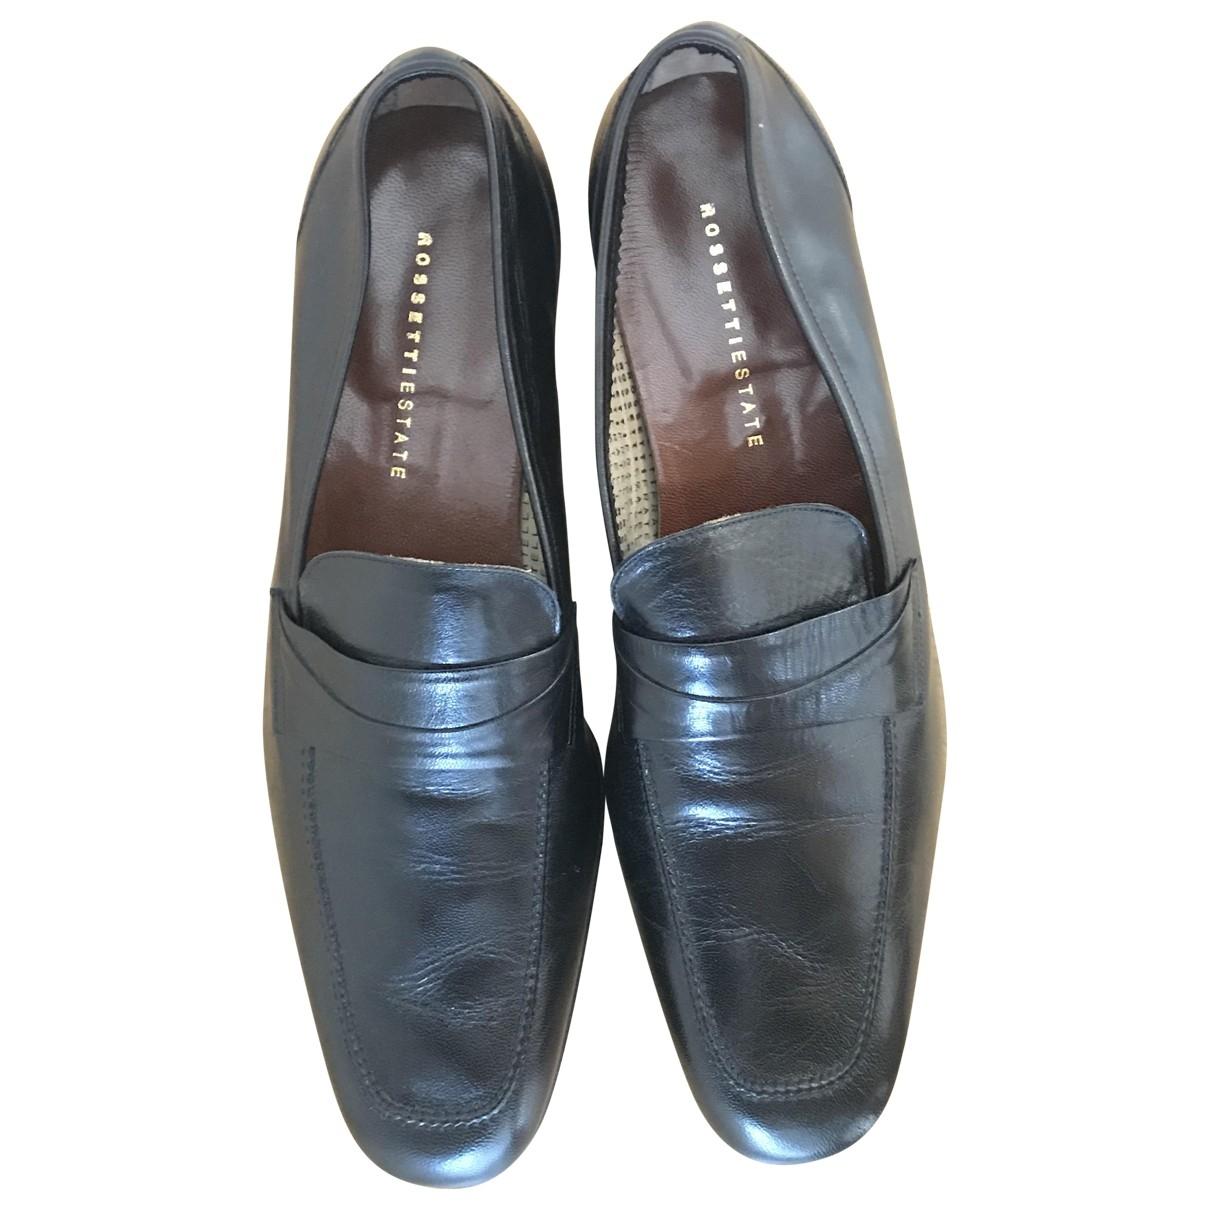 Fratelli Rossetti \N Black Leather Flats for Men 11.5 US